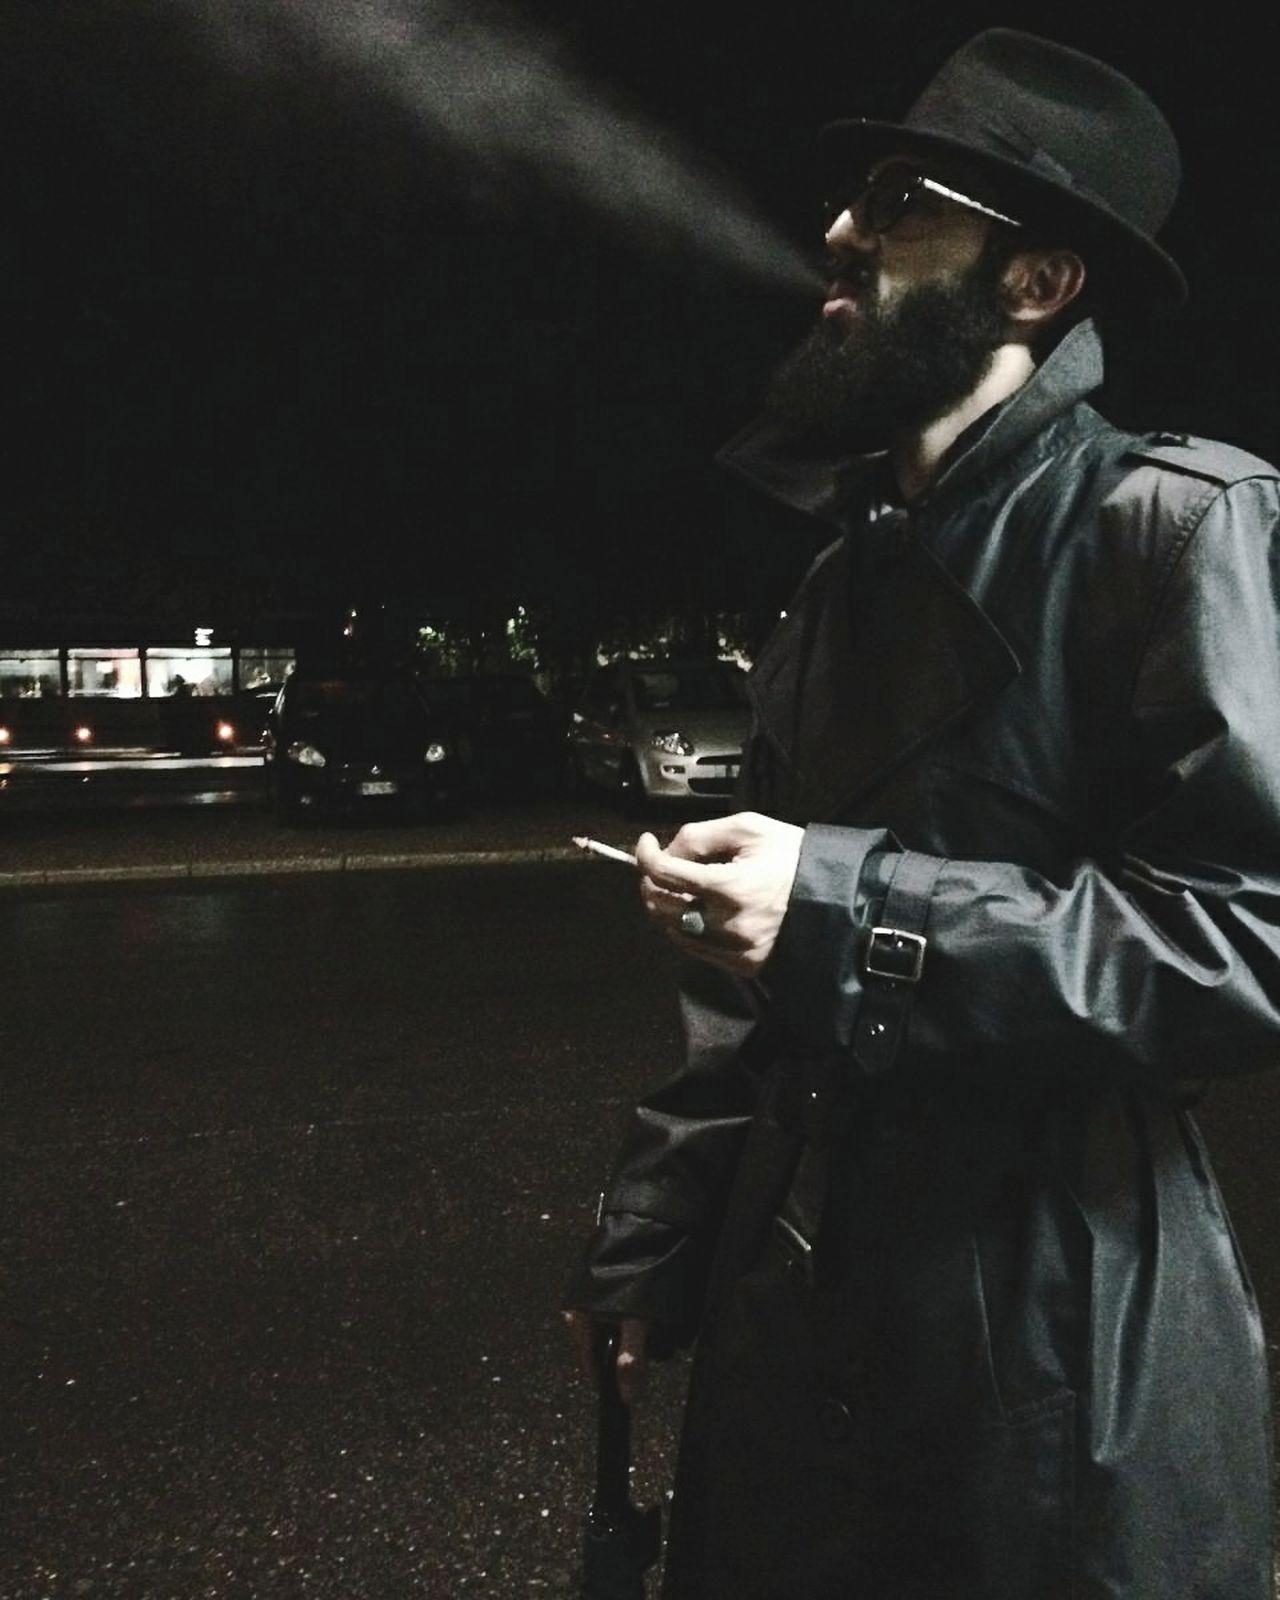 Smocking Smoke Weed Classic Style Fashion Beard Beard Festival Beardman Beardedguy Beardedking